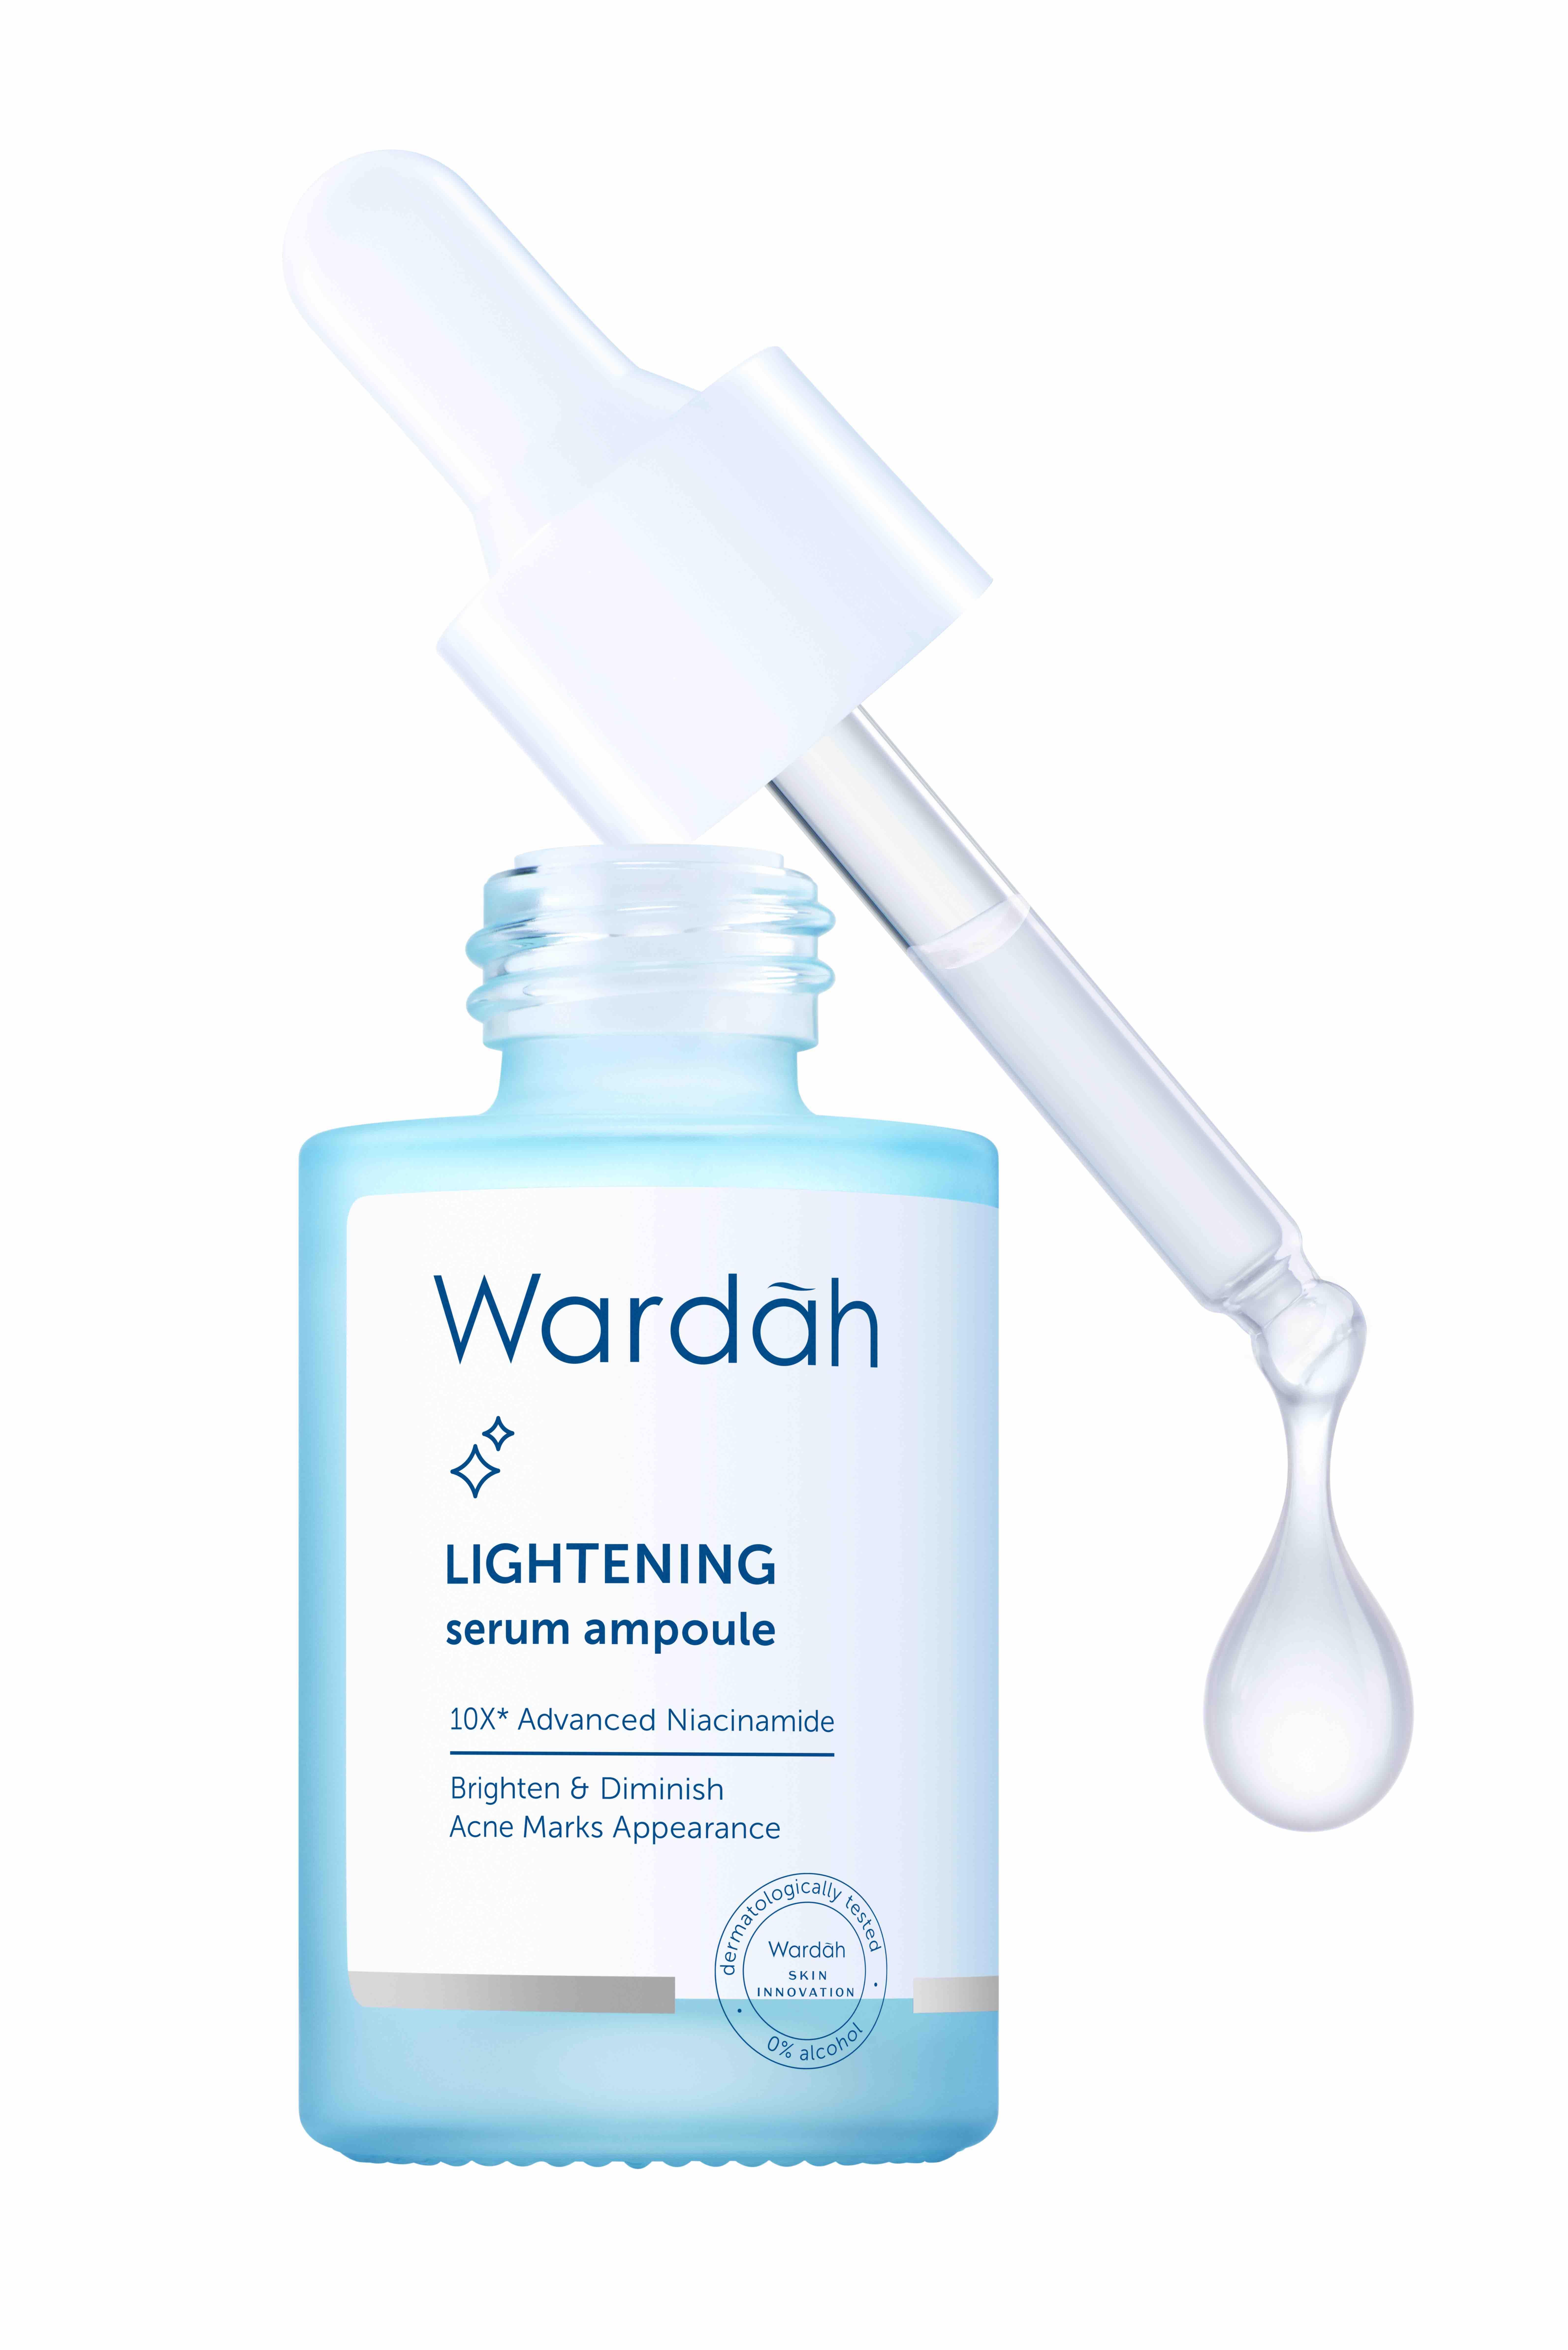 Wardah Lightening Serum Ampoule. Foto: PR Wardah